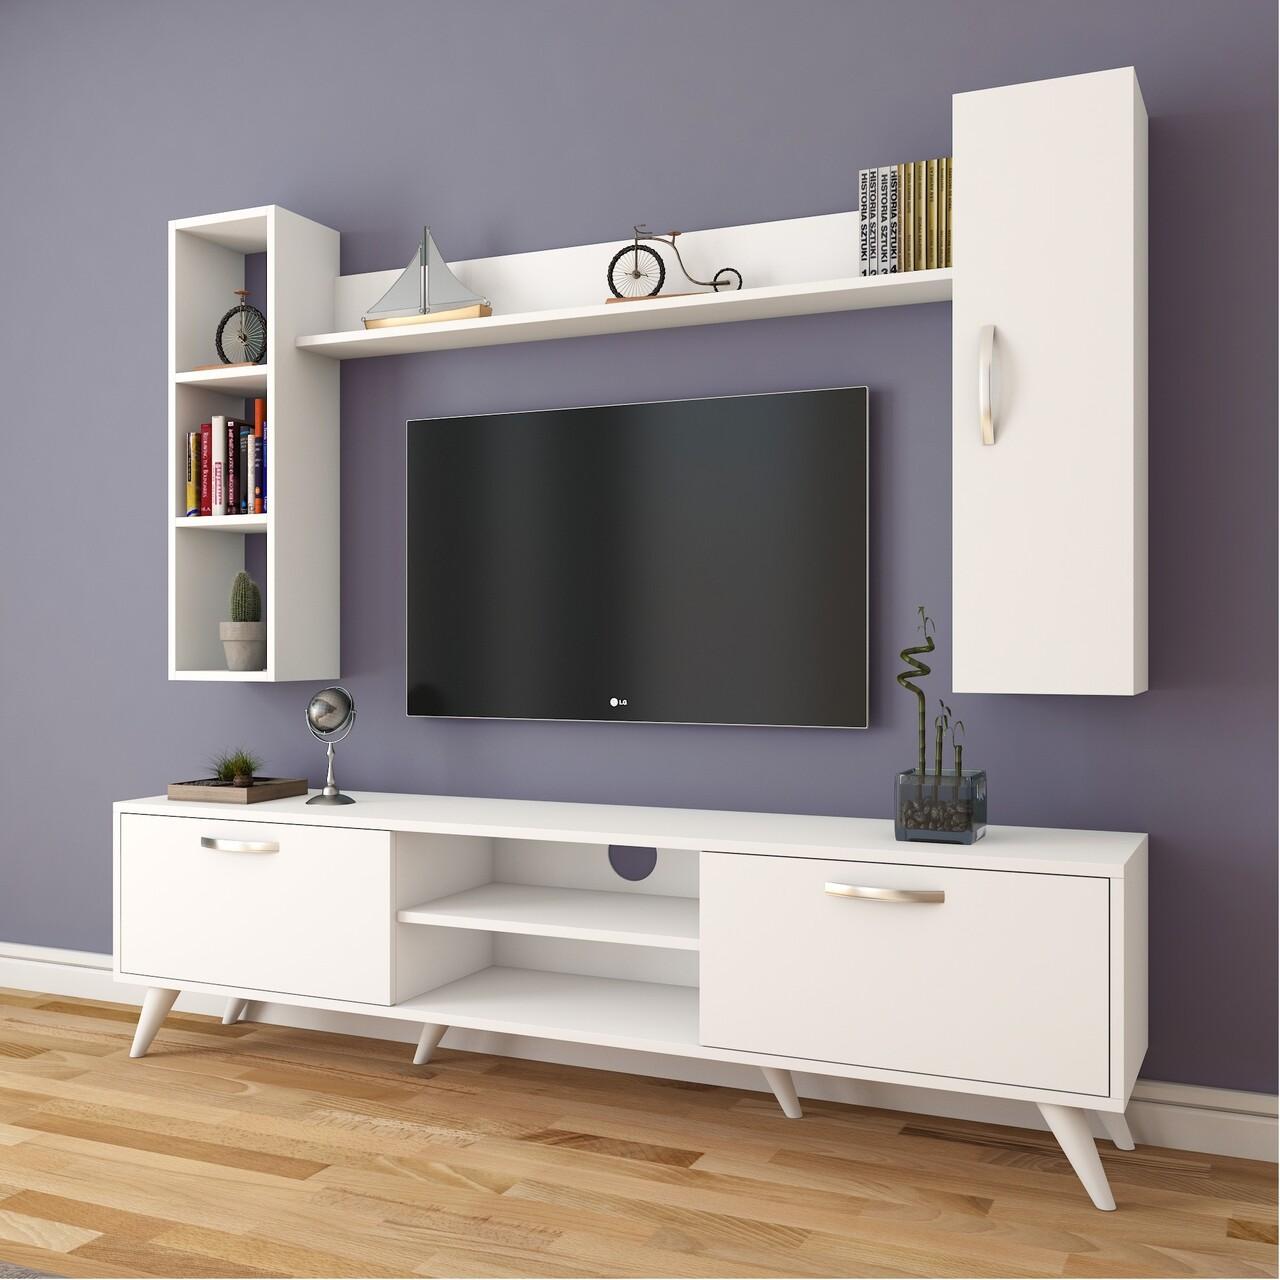 Comoda TV cu 2 rafturi de perete si cabinet M9 - 247, Wren, 180 x 35 x 48.6 cm/90 cm/133 cm, white